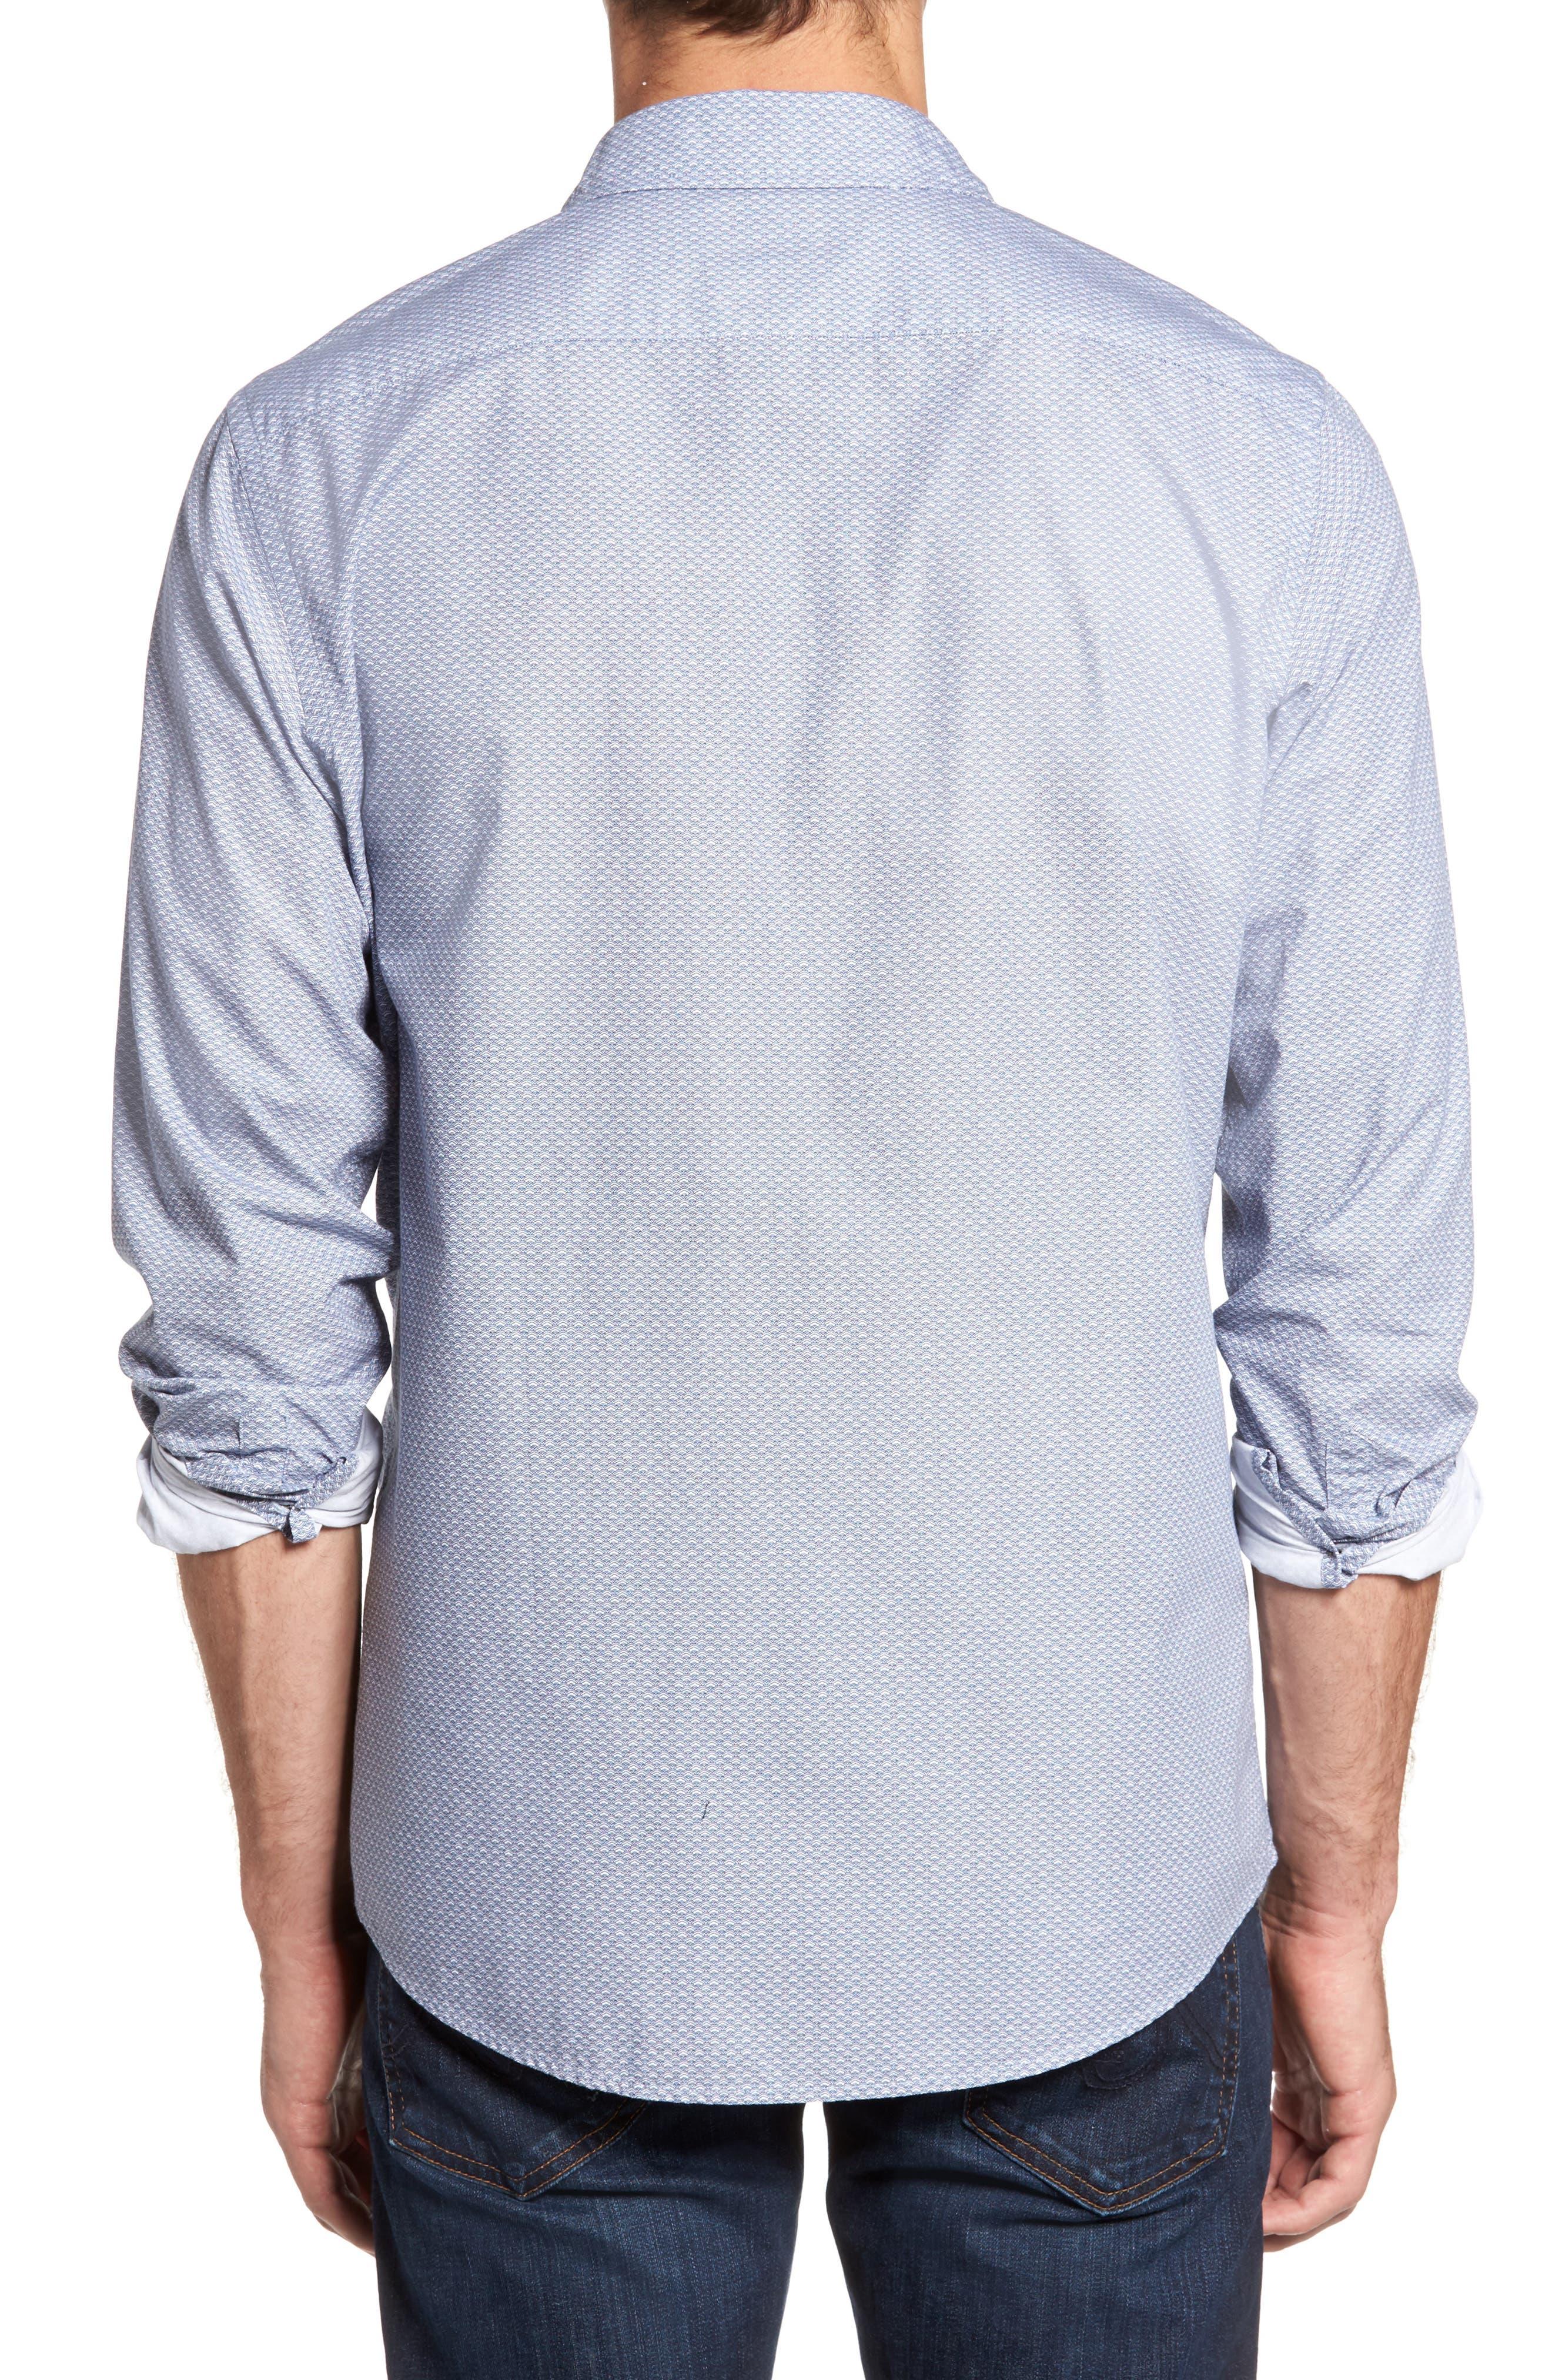 Macauley Sports Fit Print Sport Shirt,                             Alternate thumbnail 2, color,                             Royal